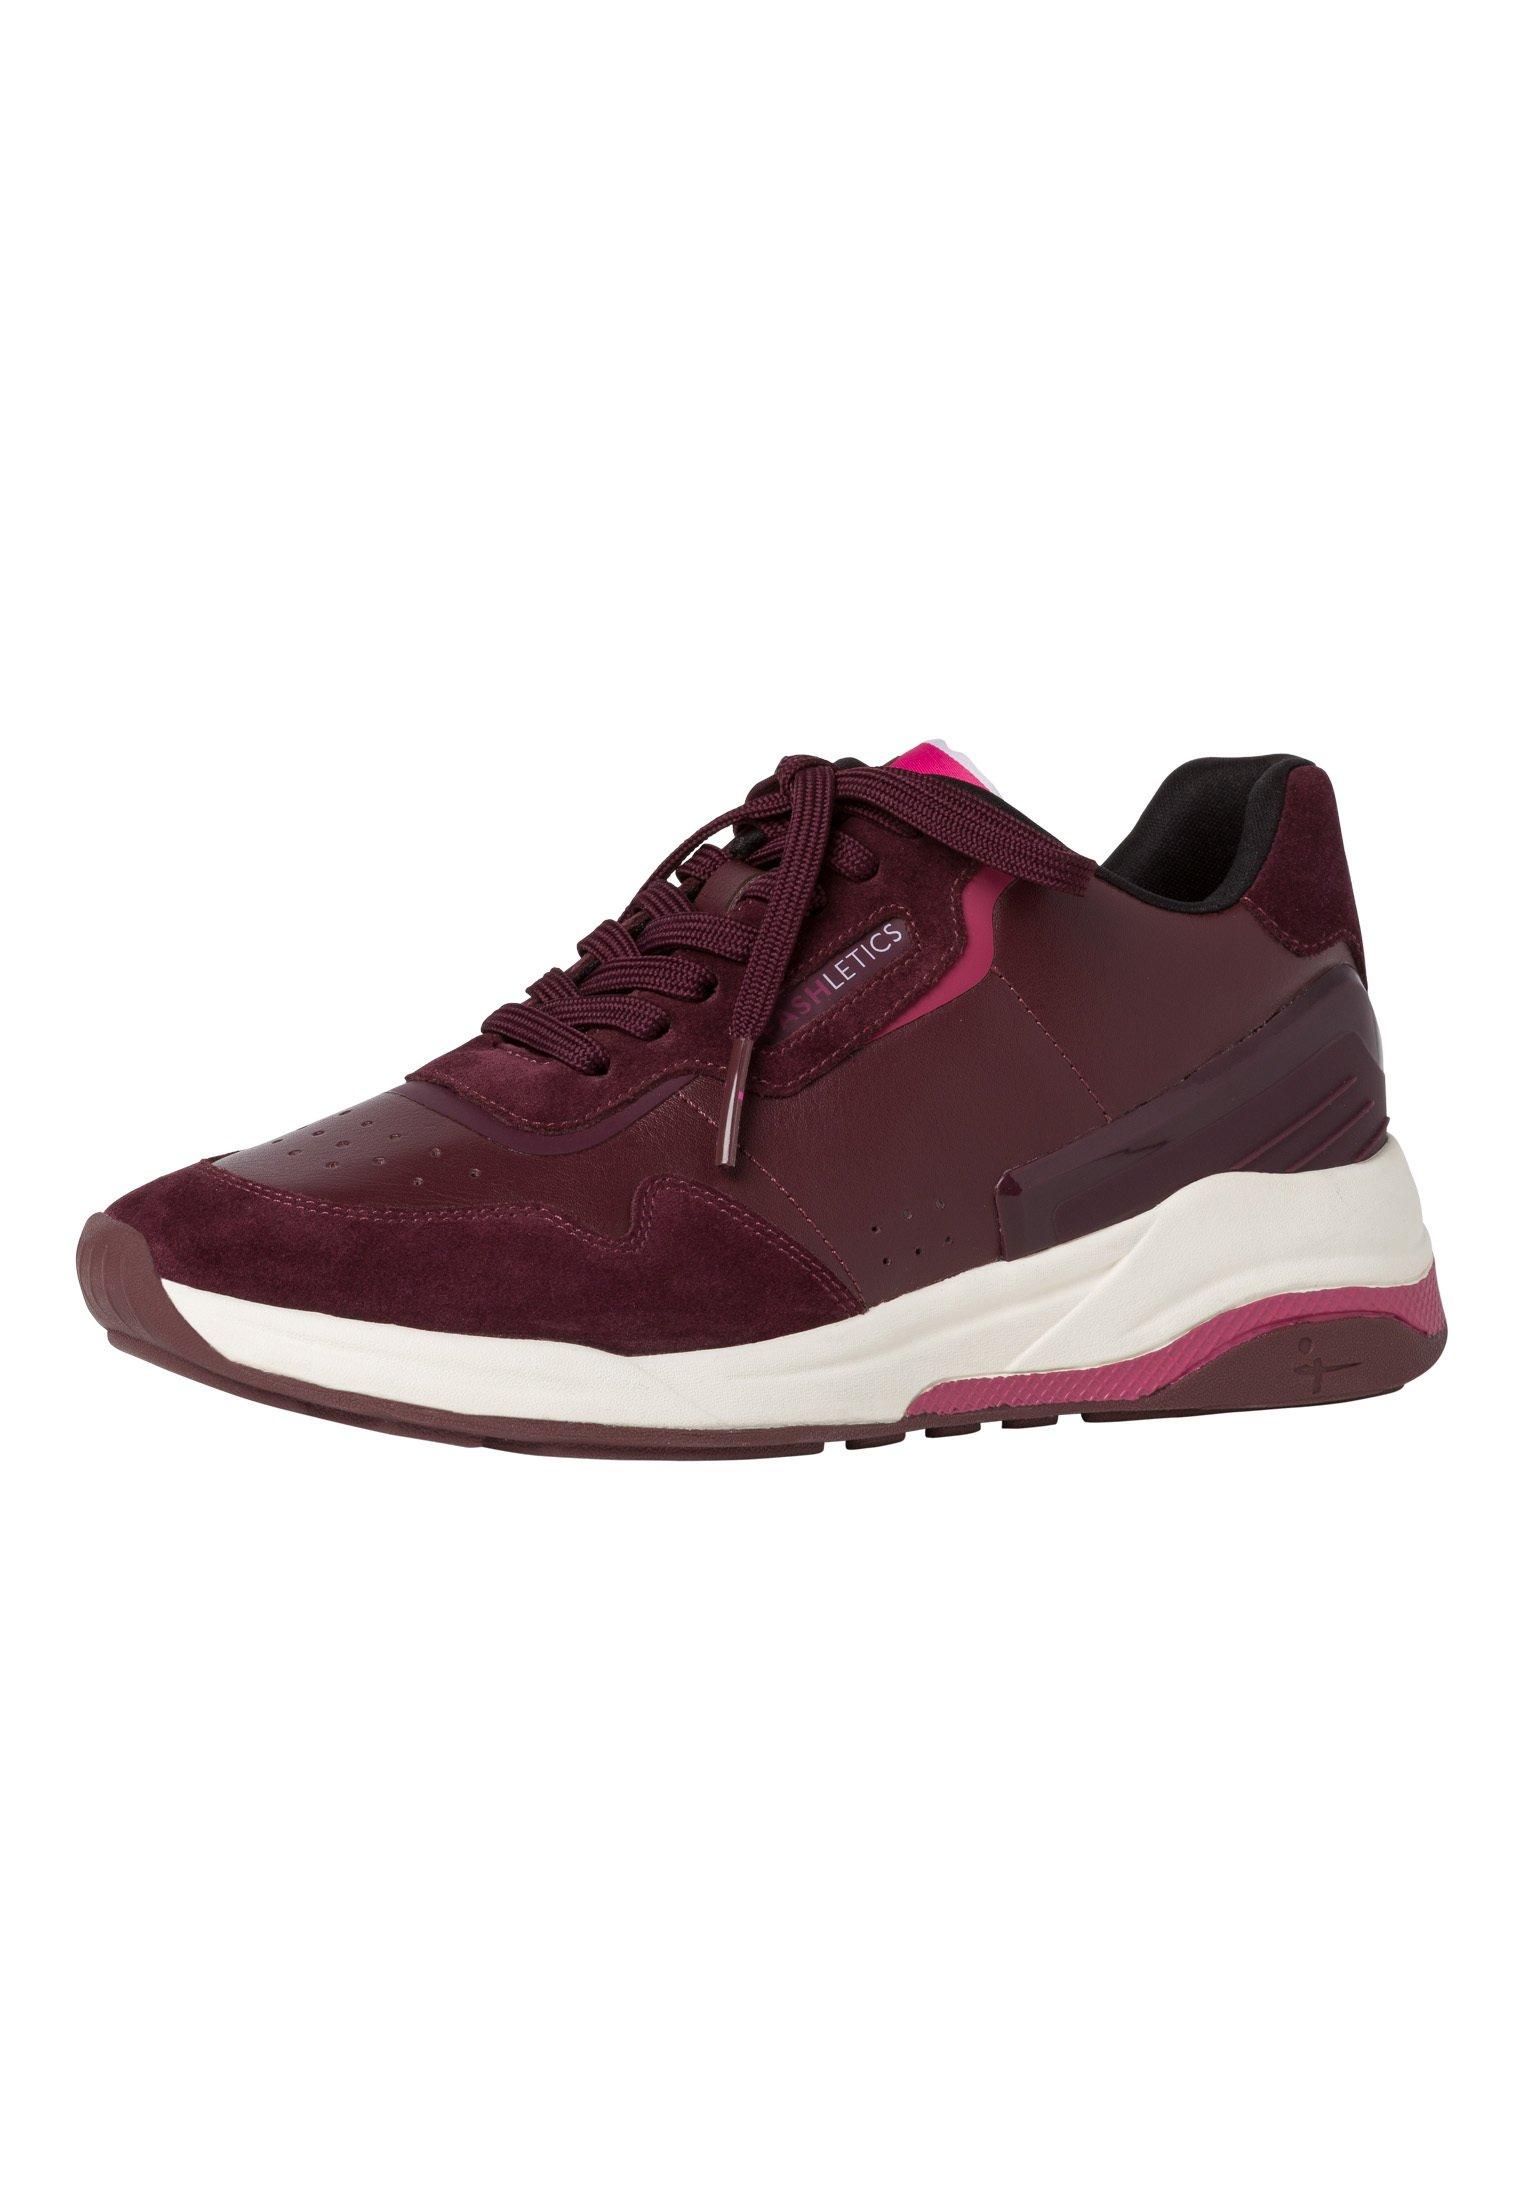 Tamaris Sneaker low amarena/dunkellila